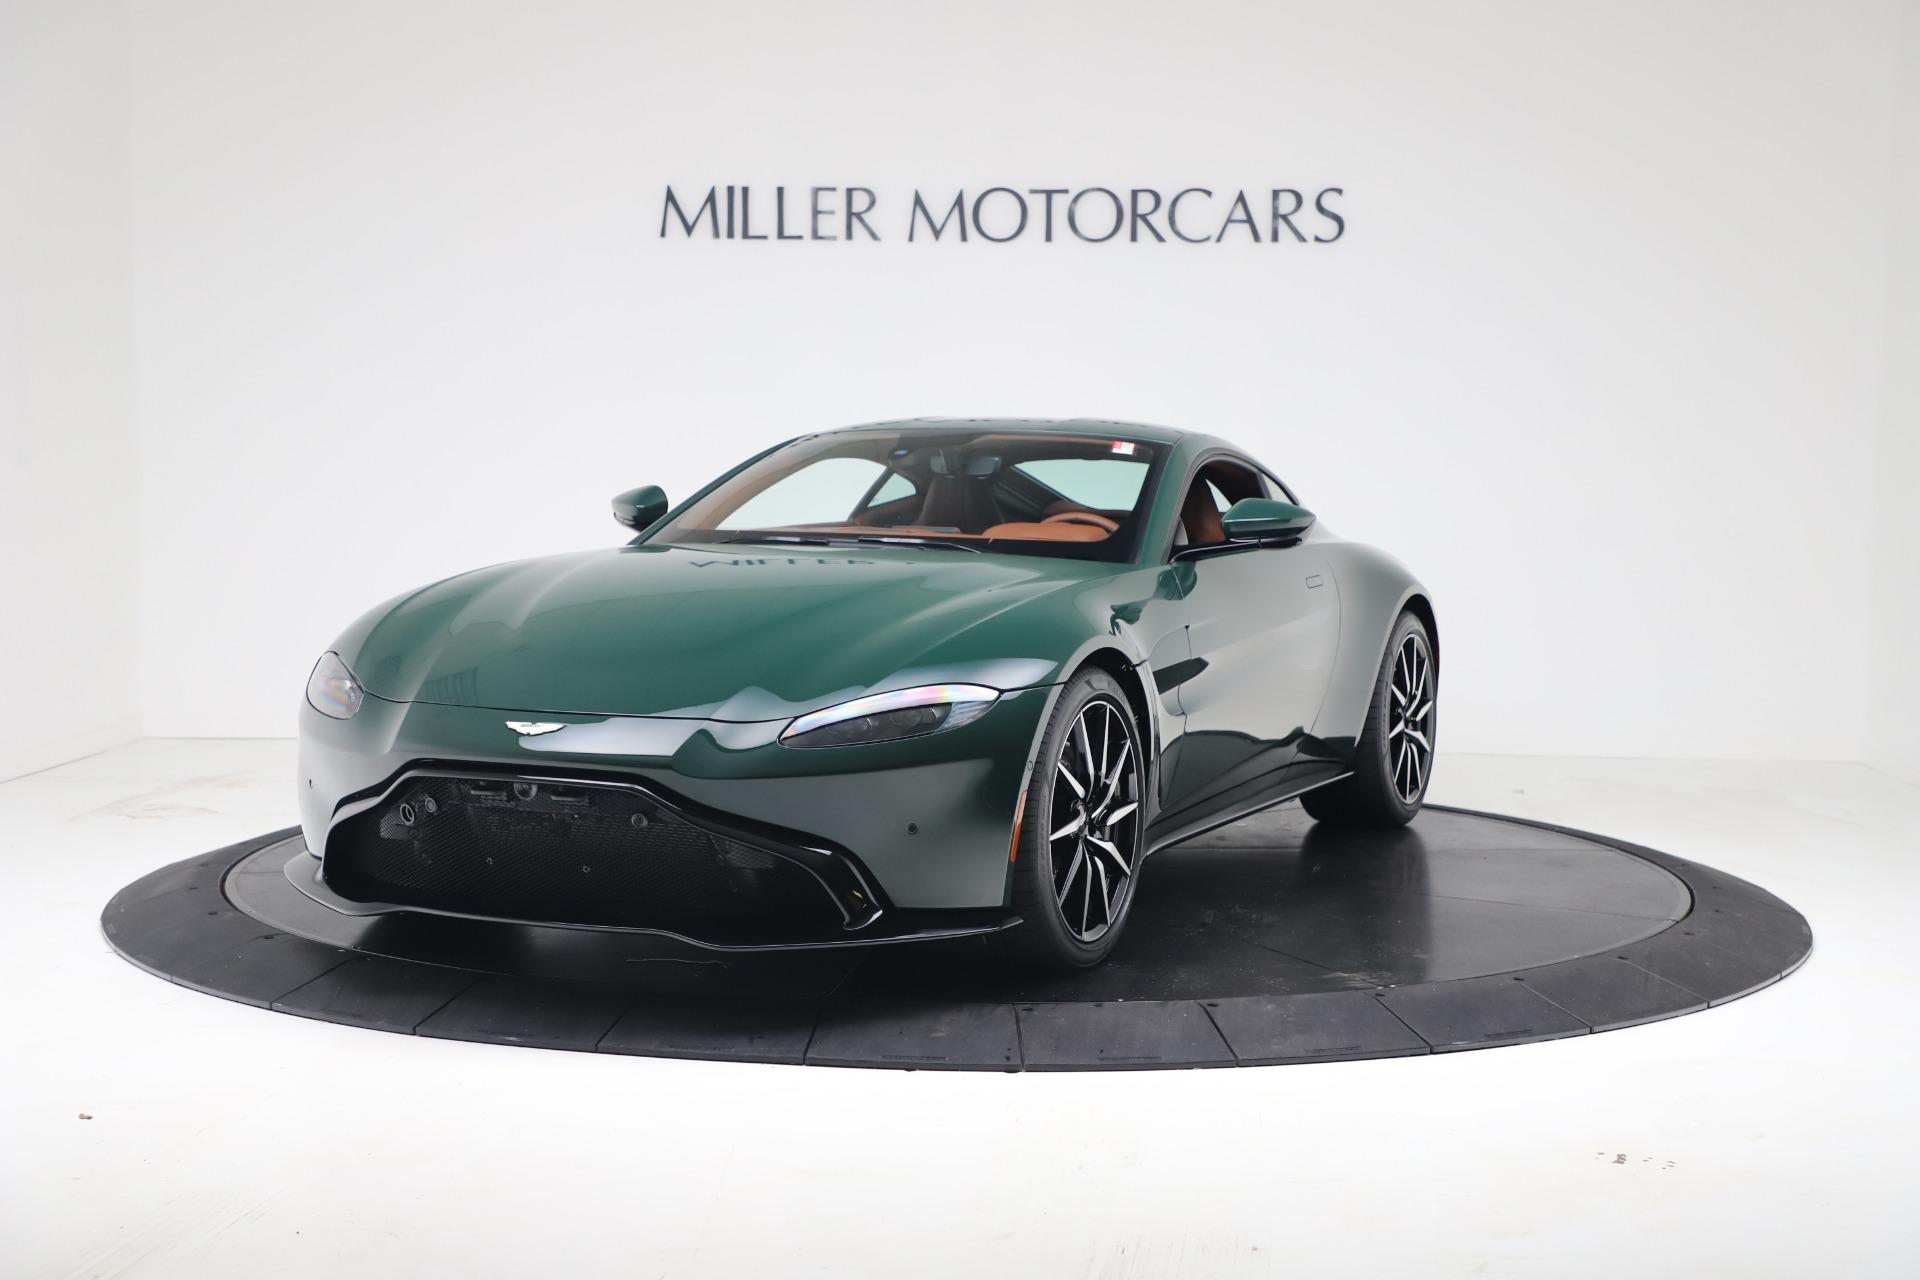 New 2020 Aston Martin Vantage V8 For Sale In Greenwich, CT 3483_p2